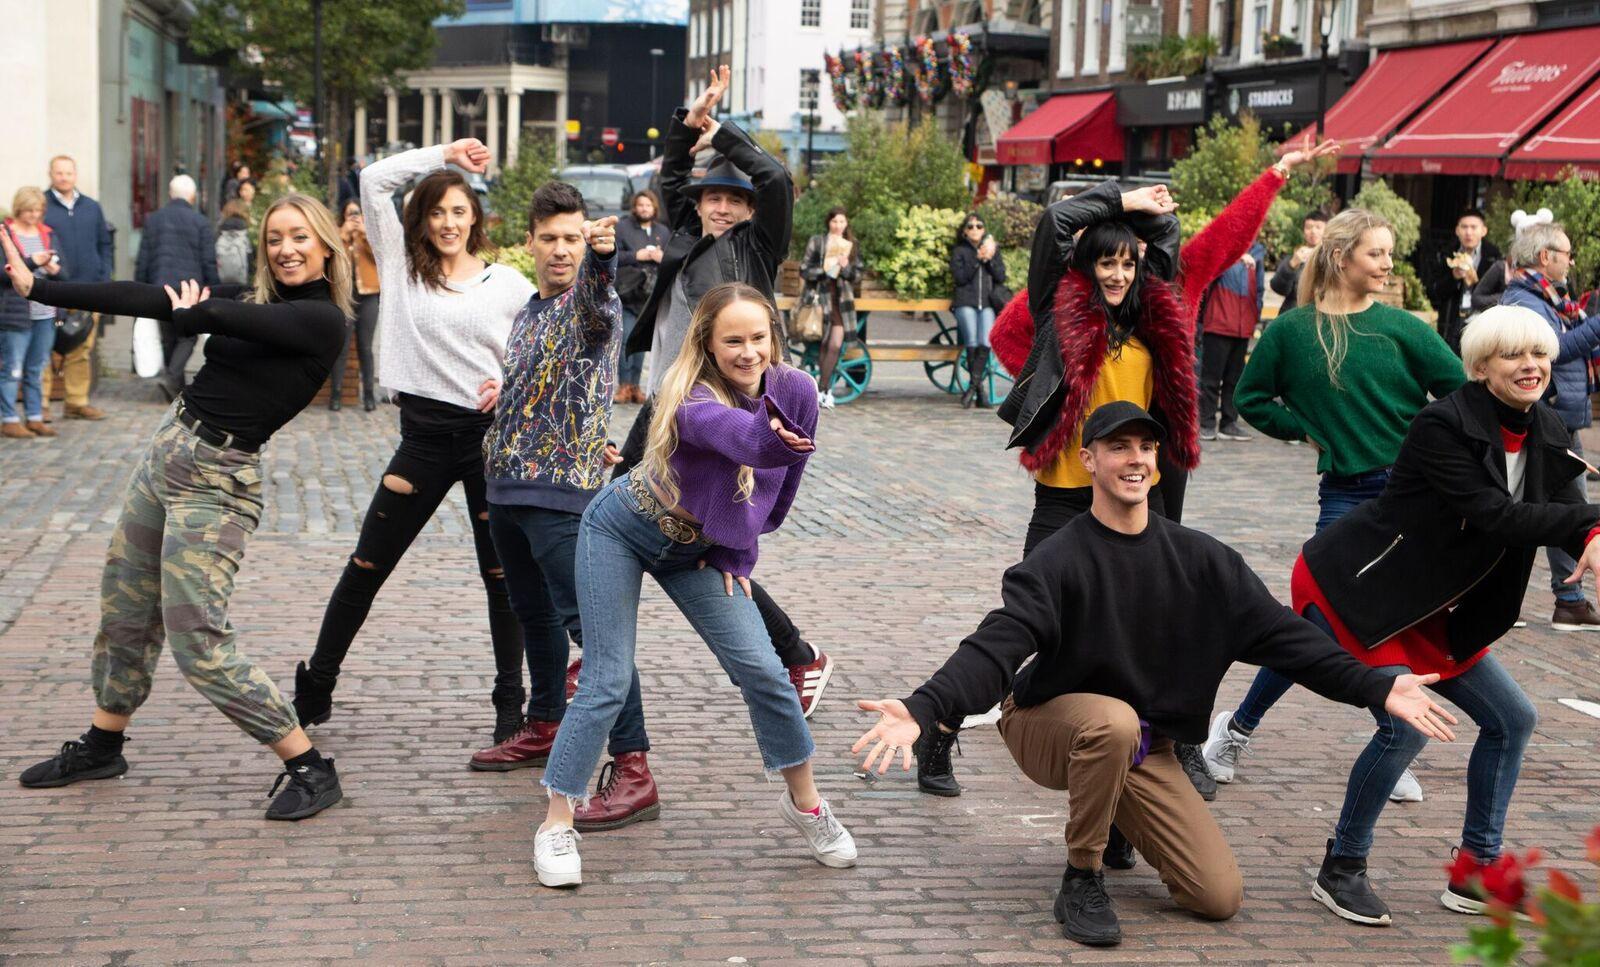 London Flash Mob Dancers